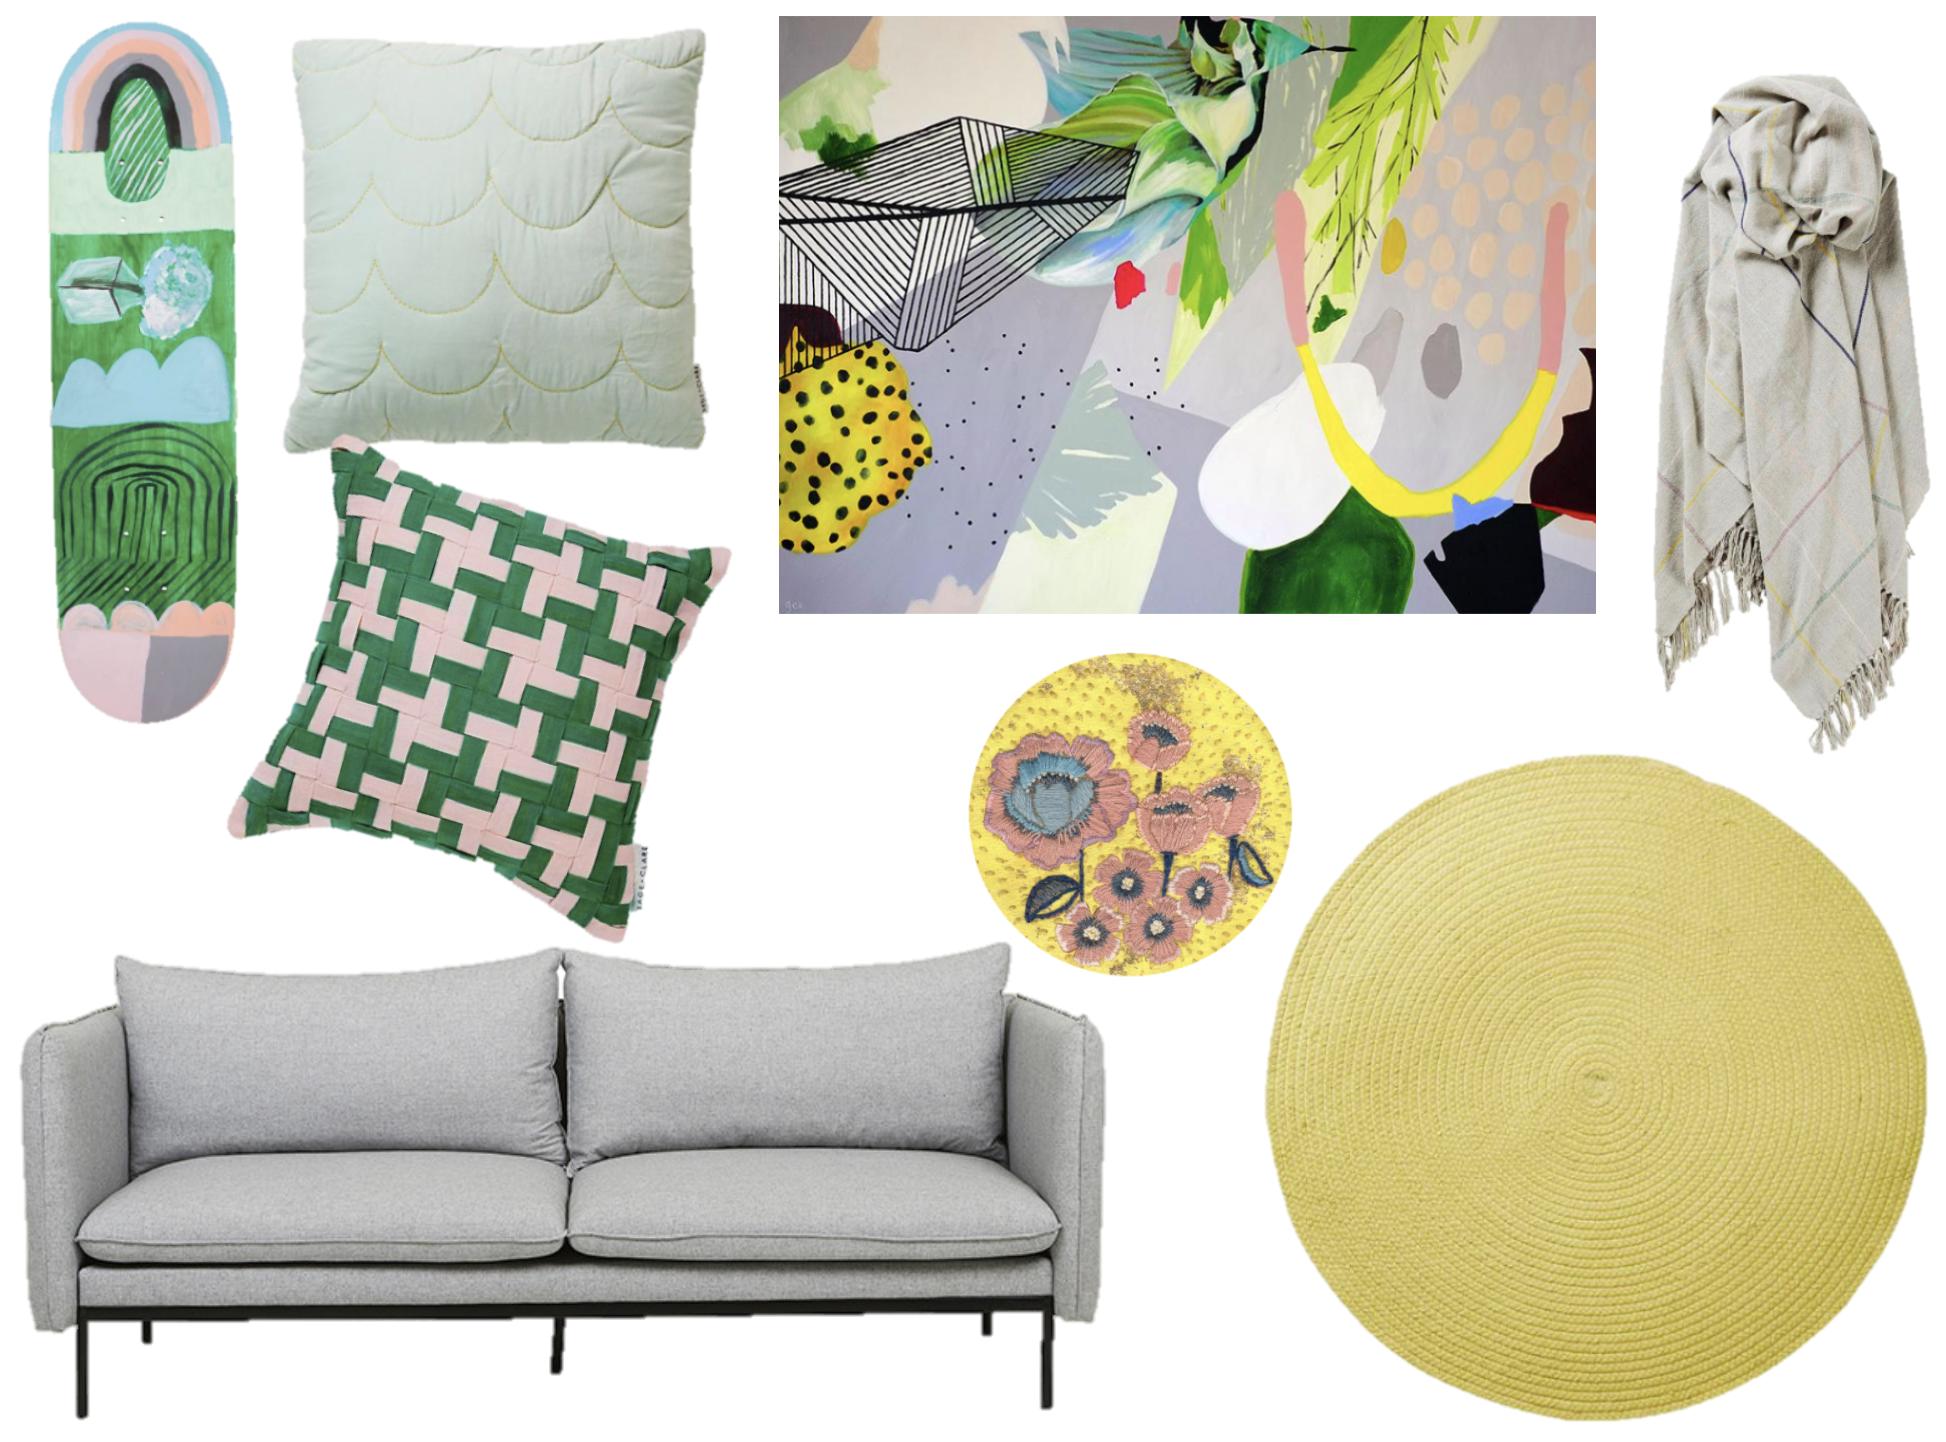 Georgie Wilson Tiger Style 3 /J ade cushion /  Houndstooth cushion /  Throw /  Dandelion Rug  /  Fleur Woods Golden Dawn /  Grass is Greener skateboard